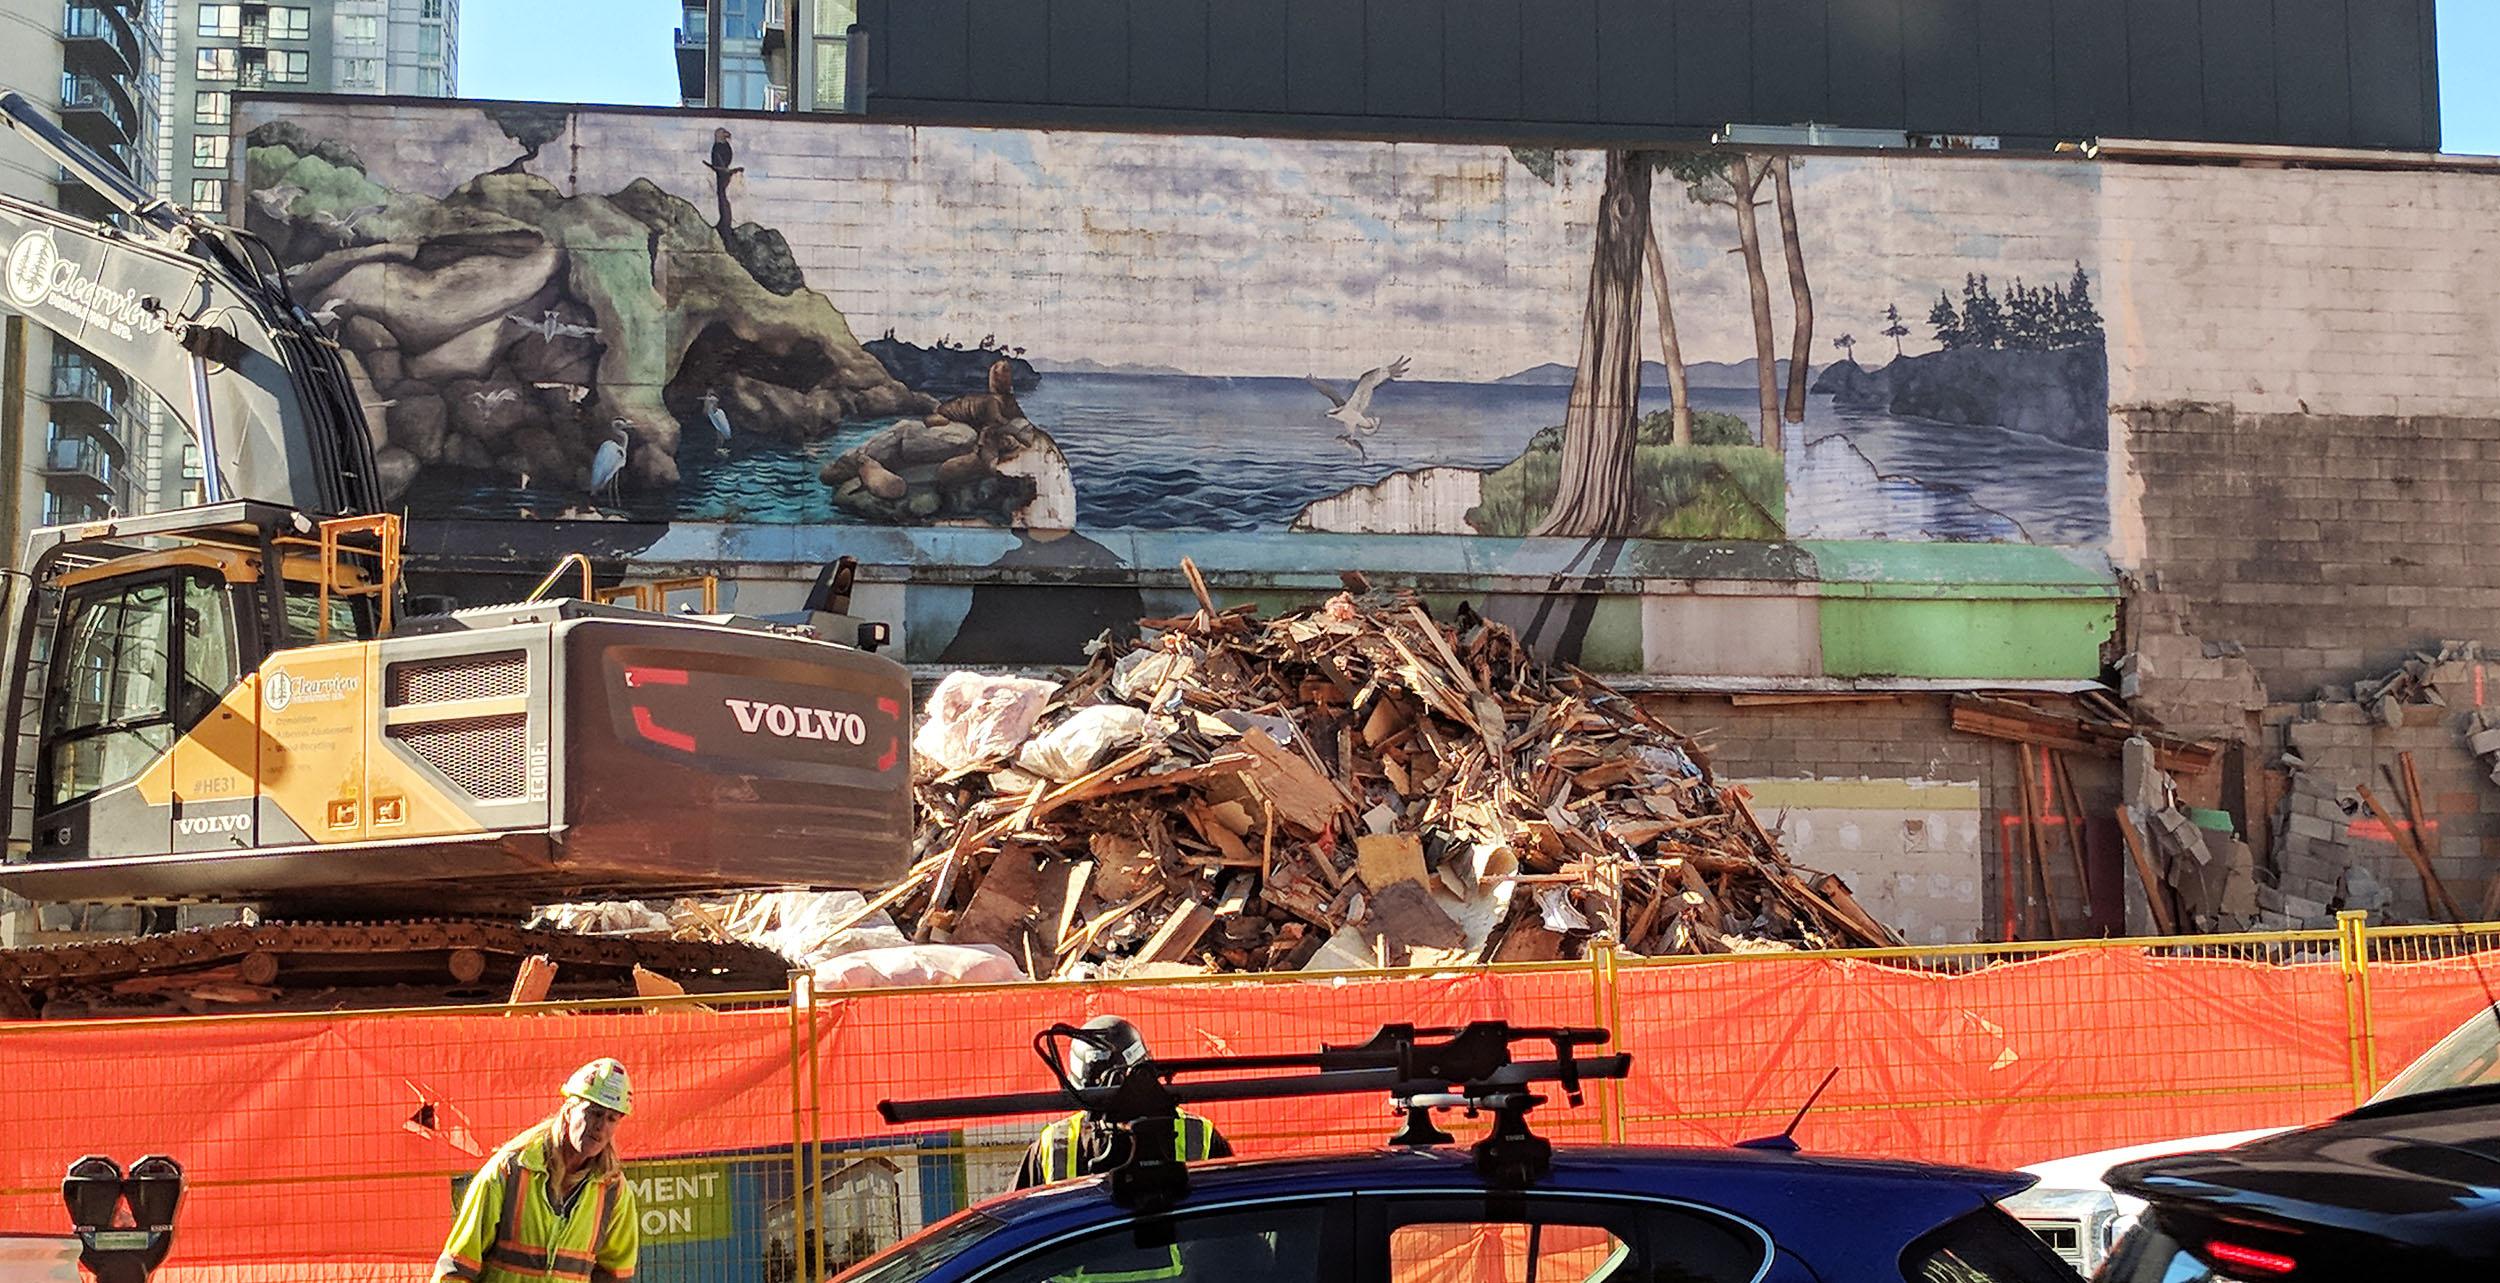 Mural at Drake and Seymour (Jenni Sheppard/Daily Hive)